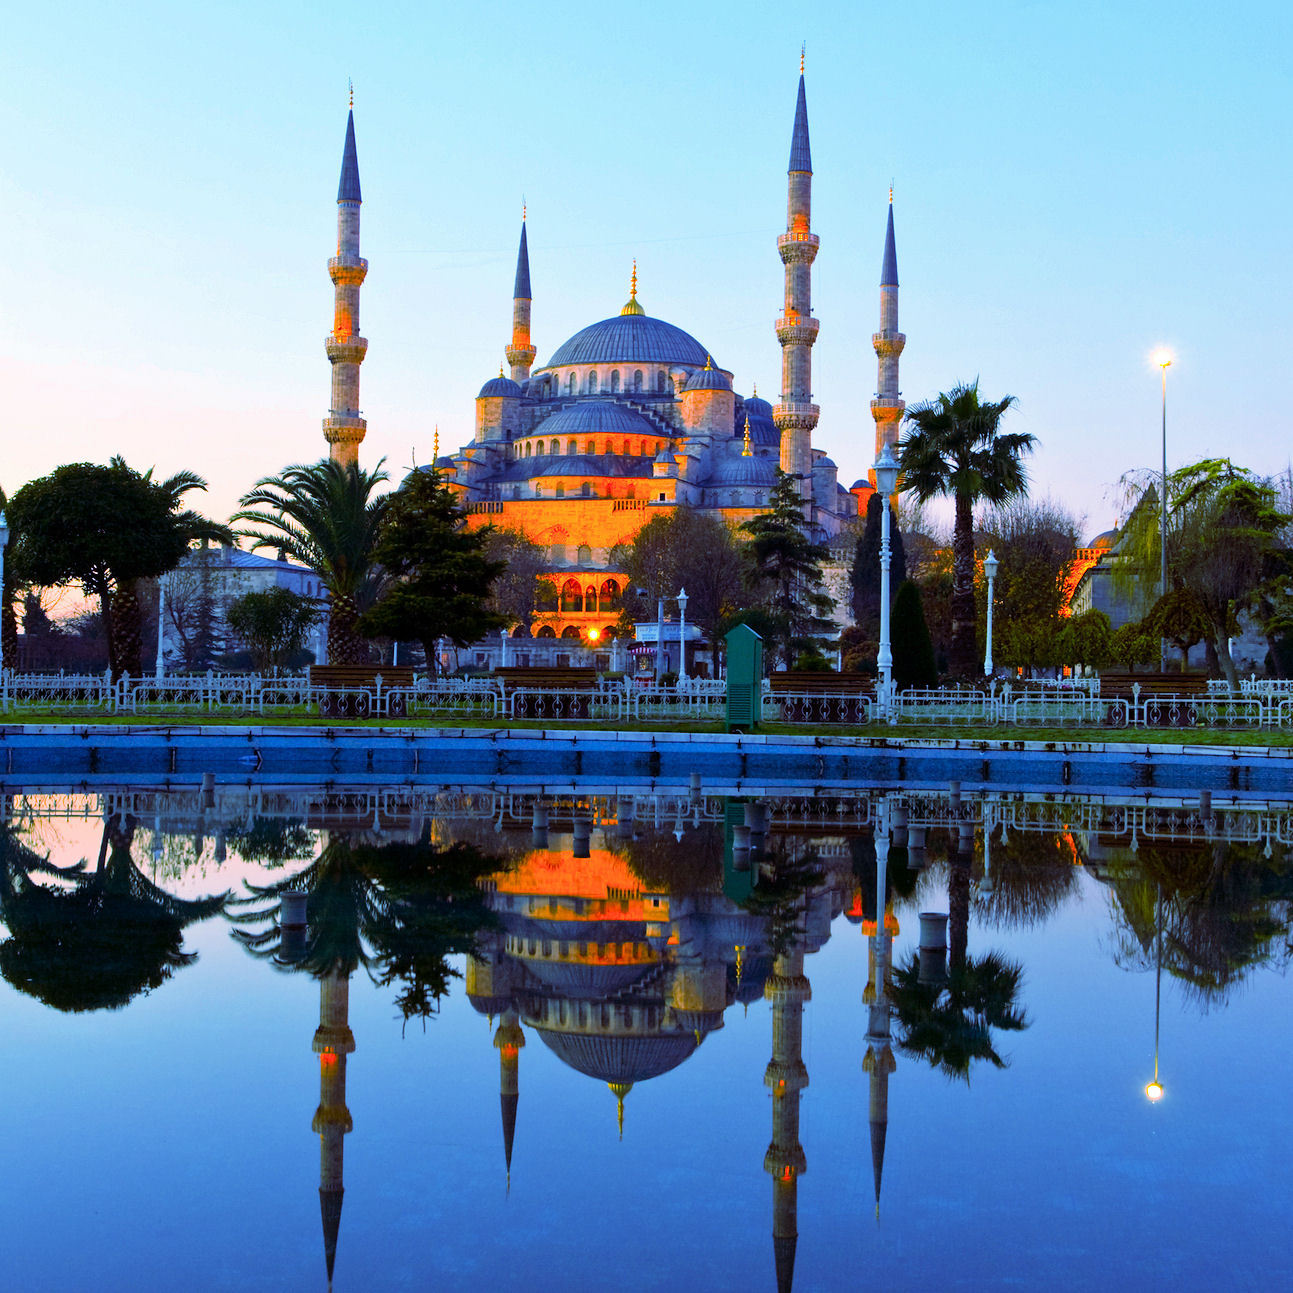 Hotels near Istanbul